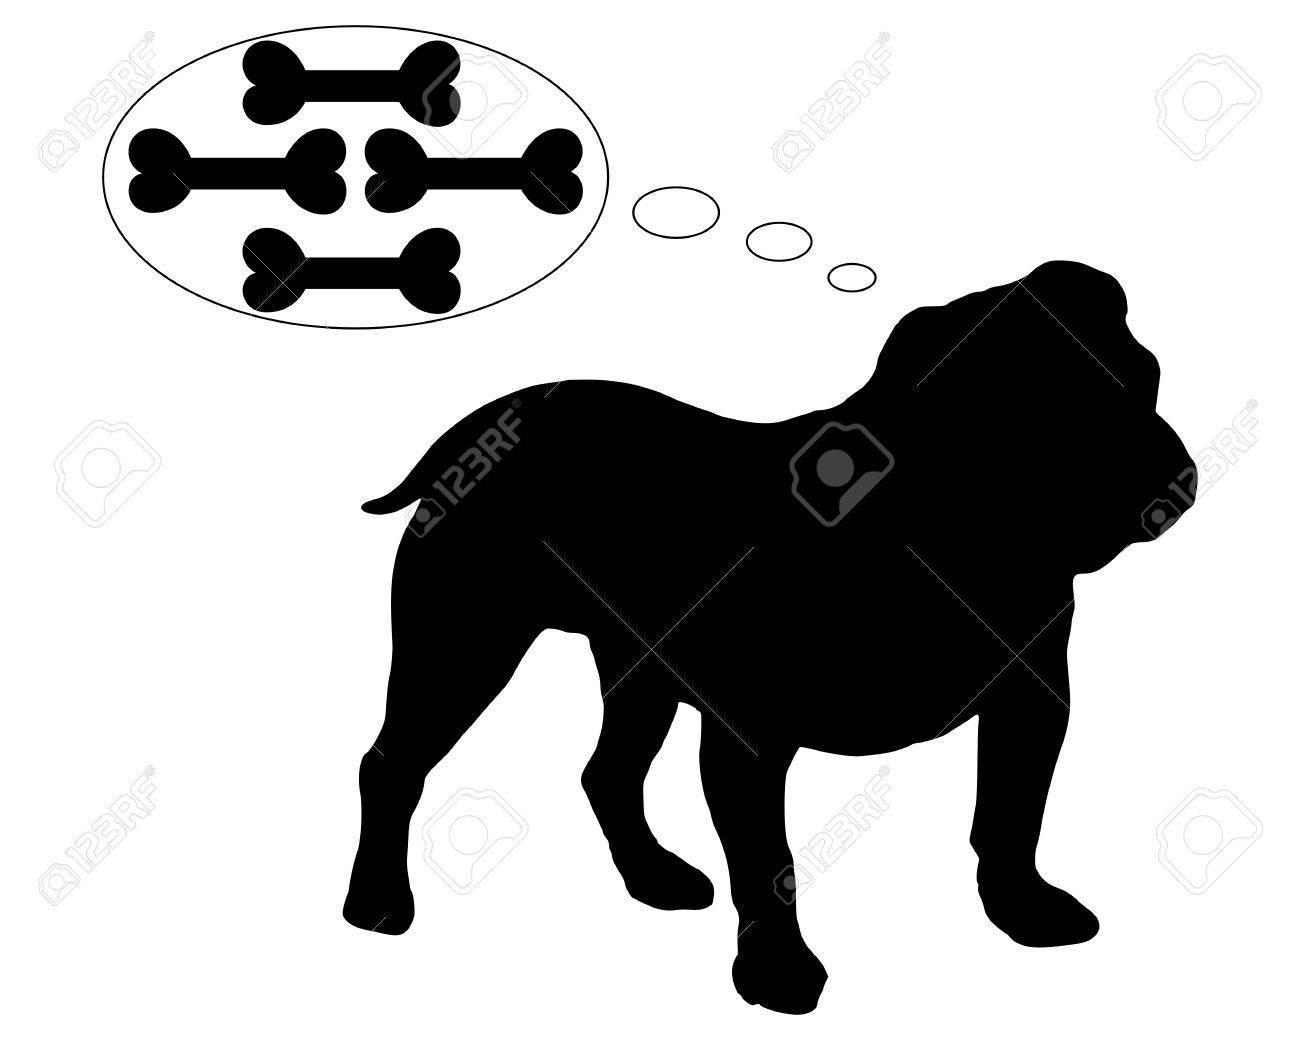 Hungry english bulldog dreams of many bones Stock Vector - 5802142